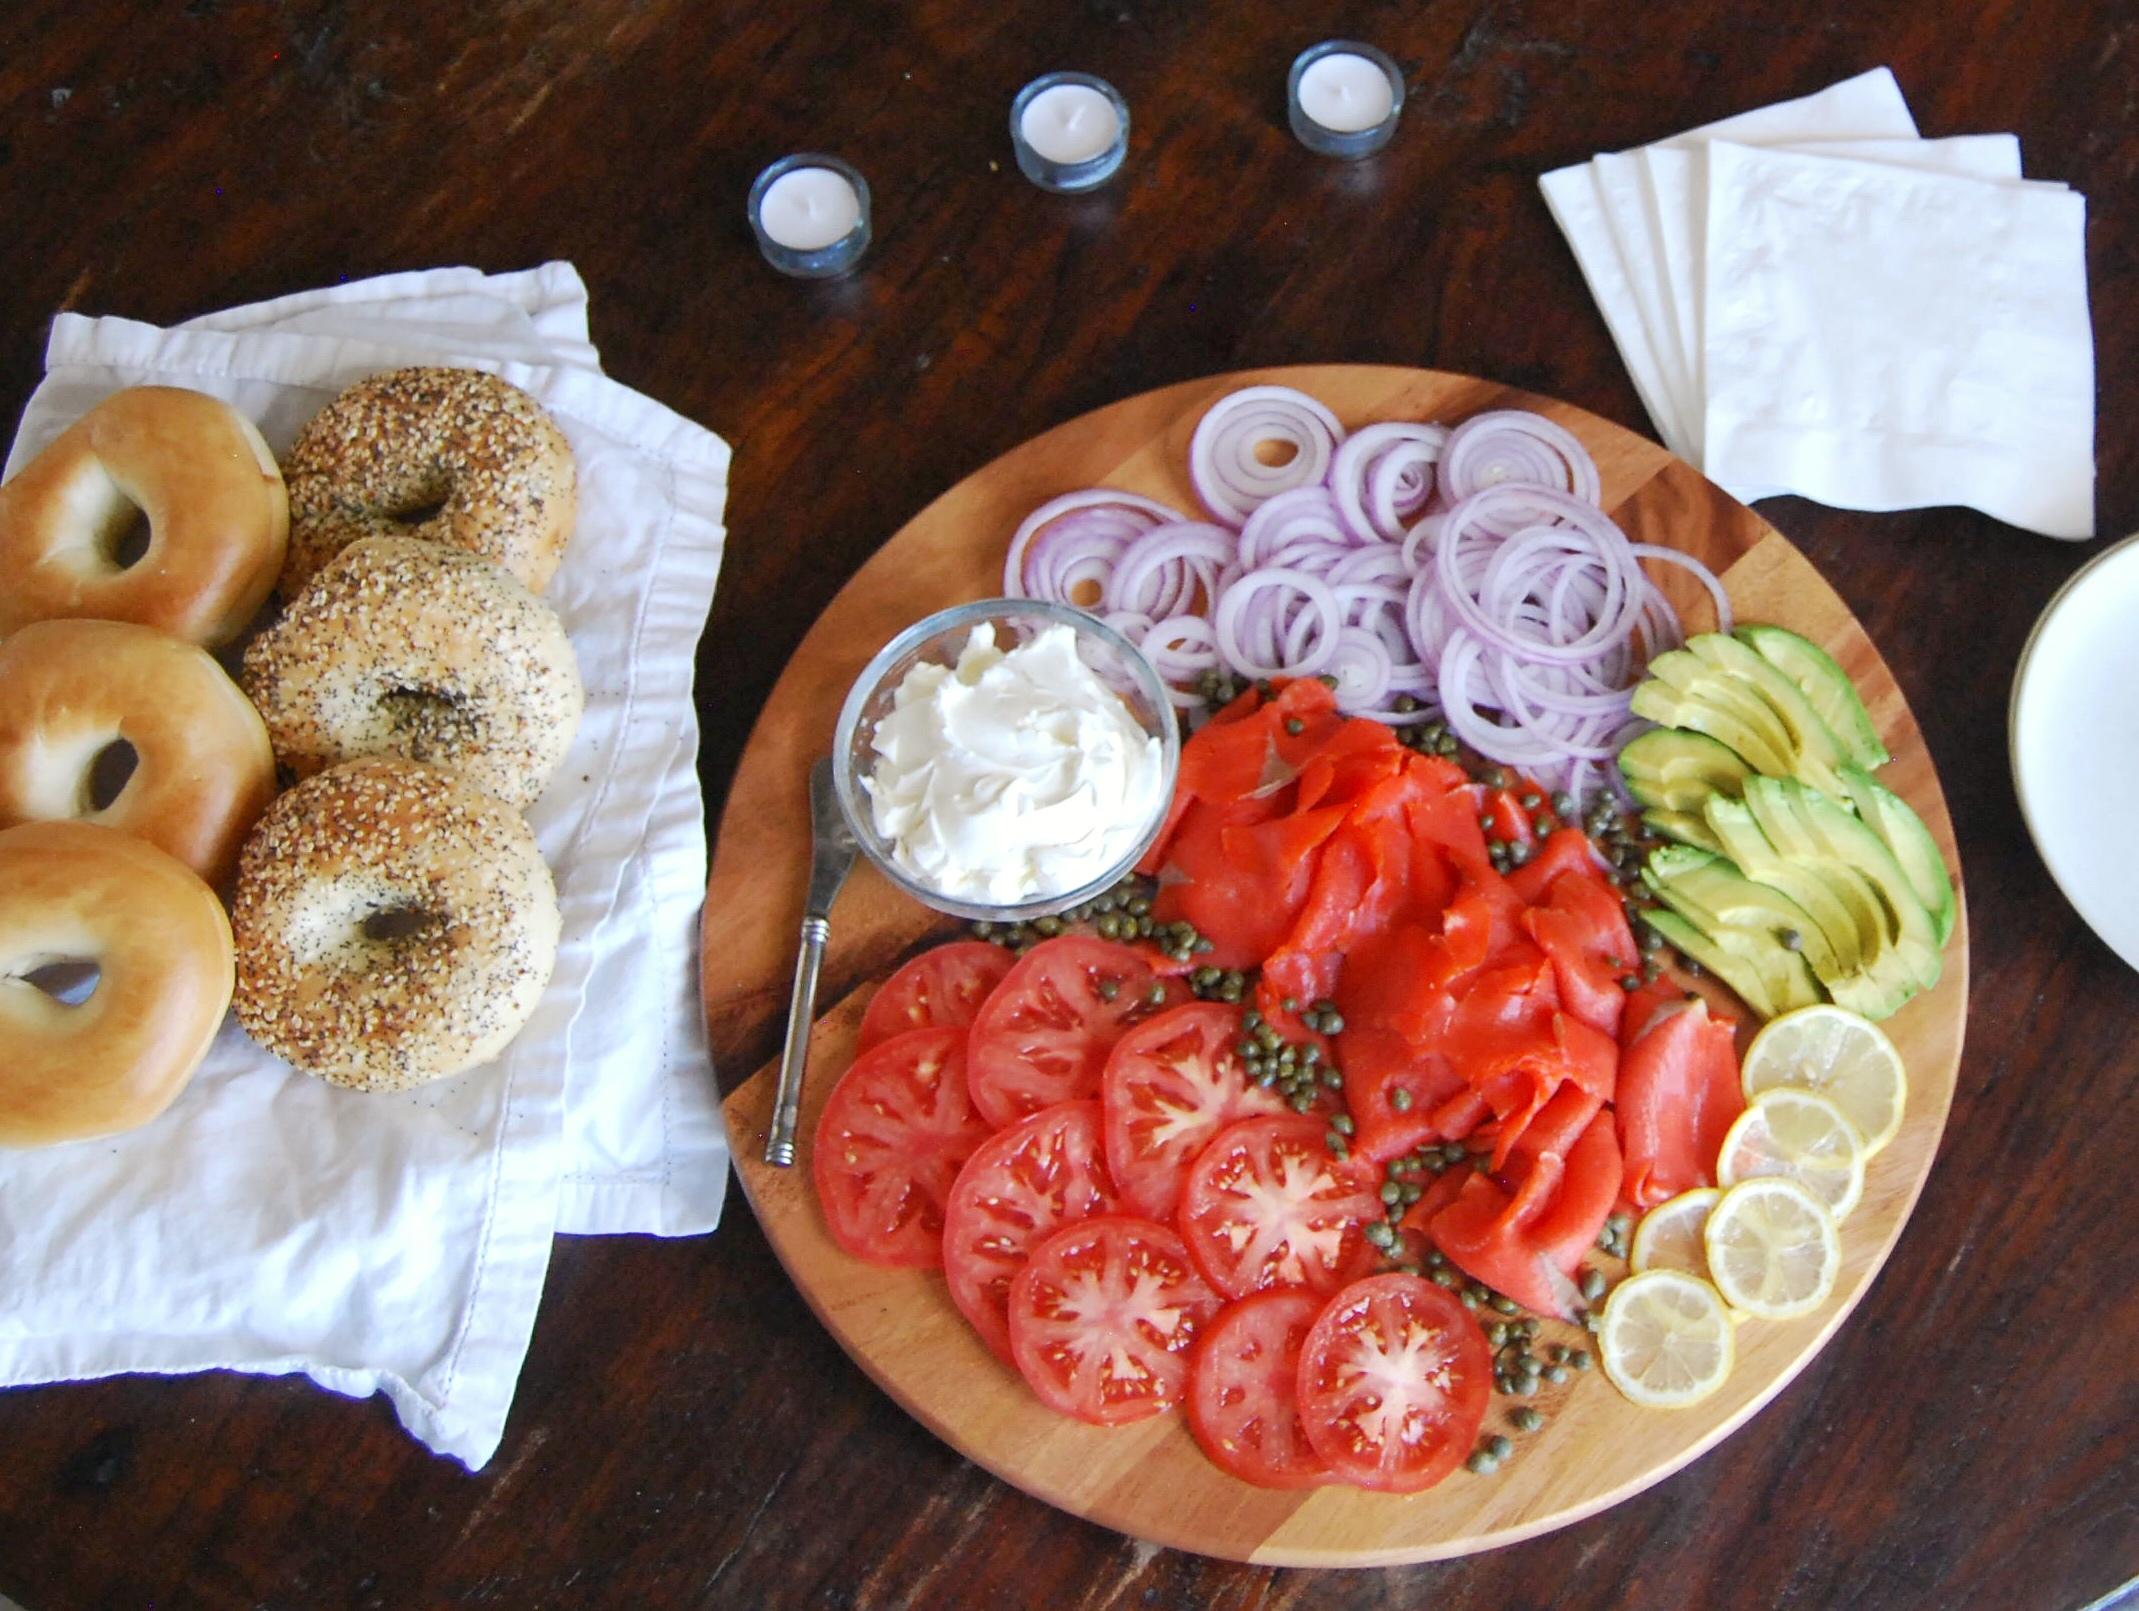 HungryTwenties Bagel and Lox Platter